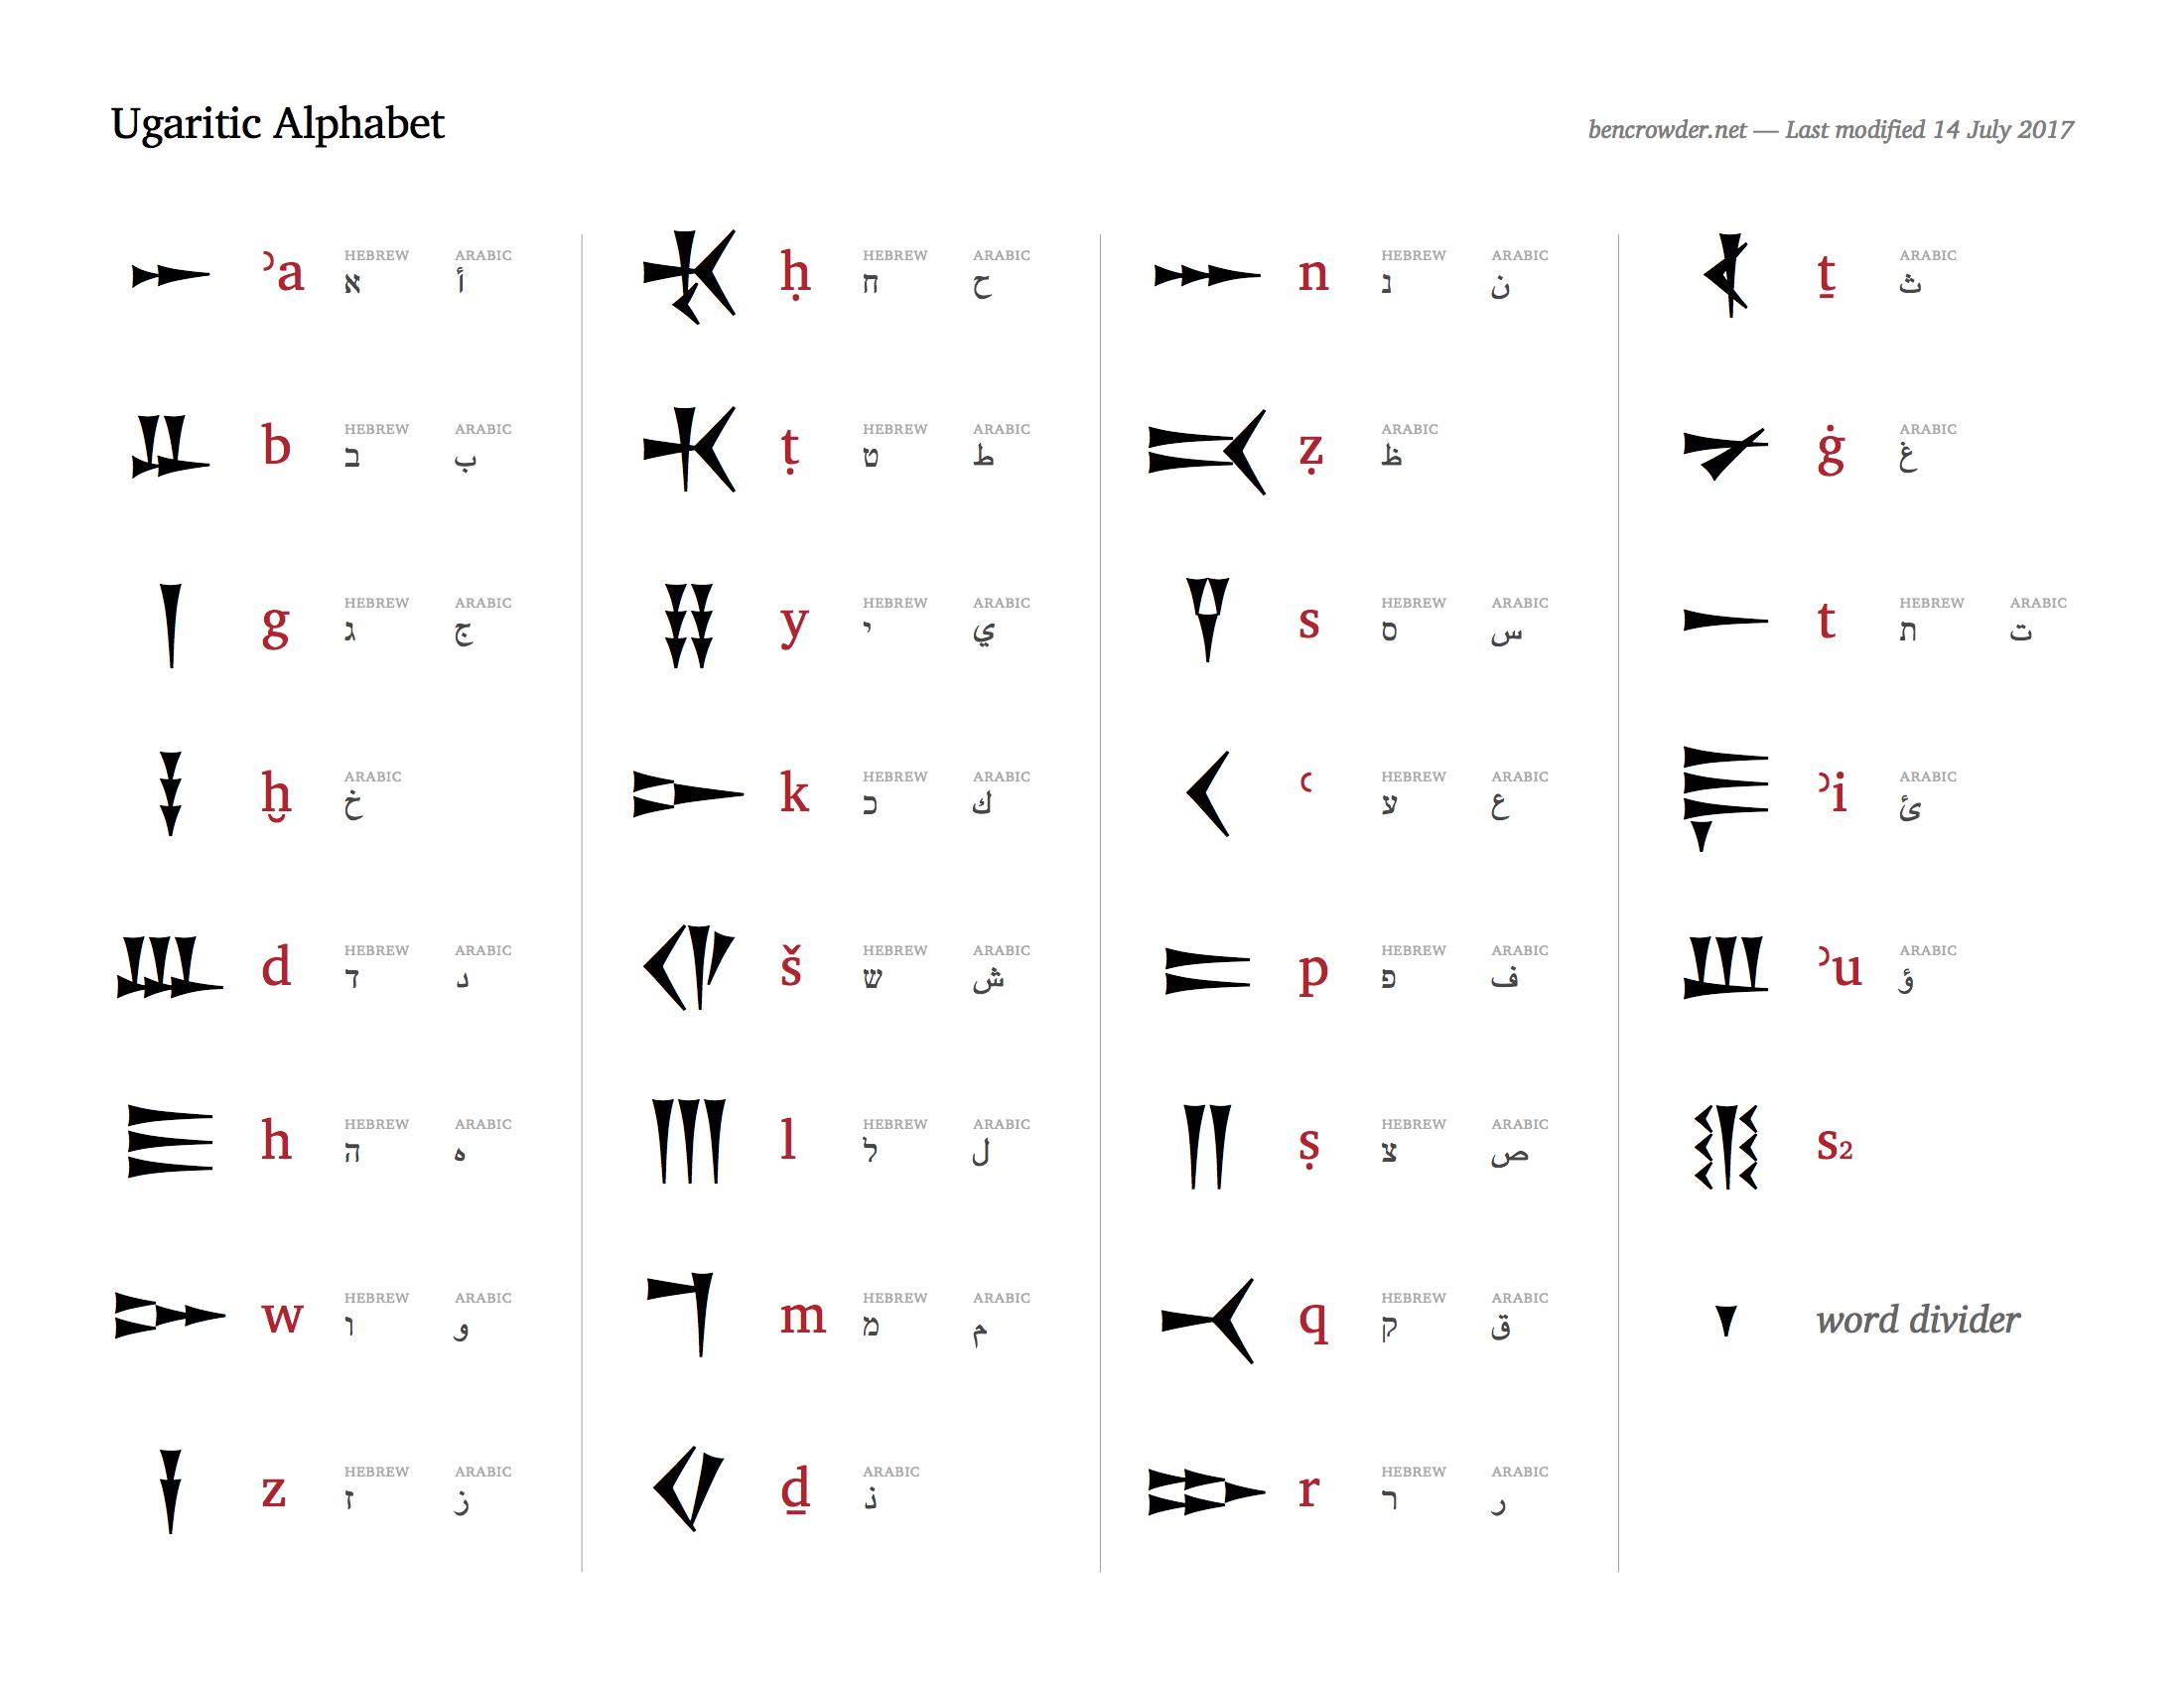 Ugaritic Alphabet Chart